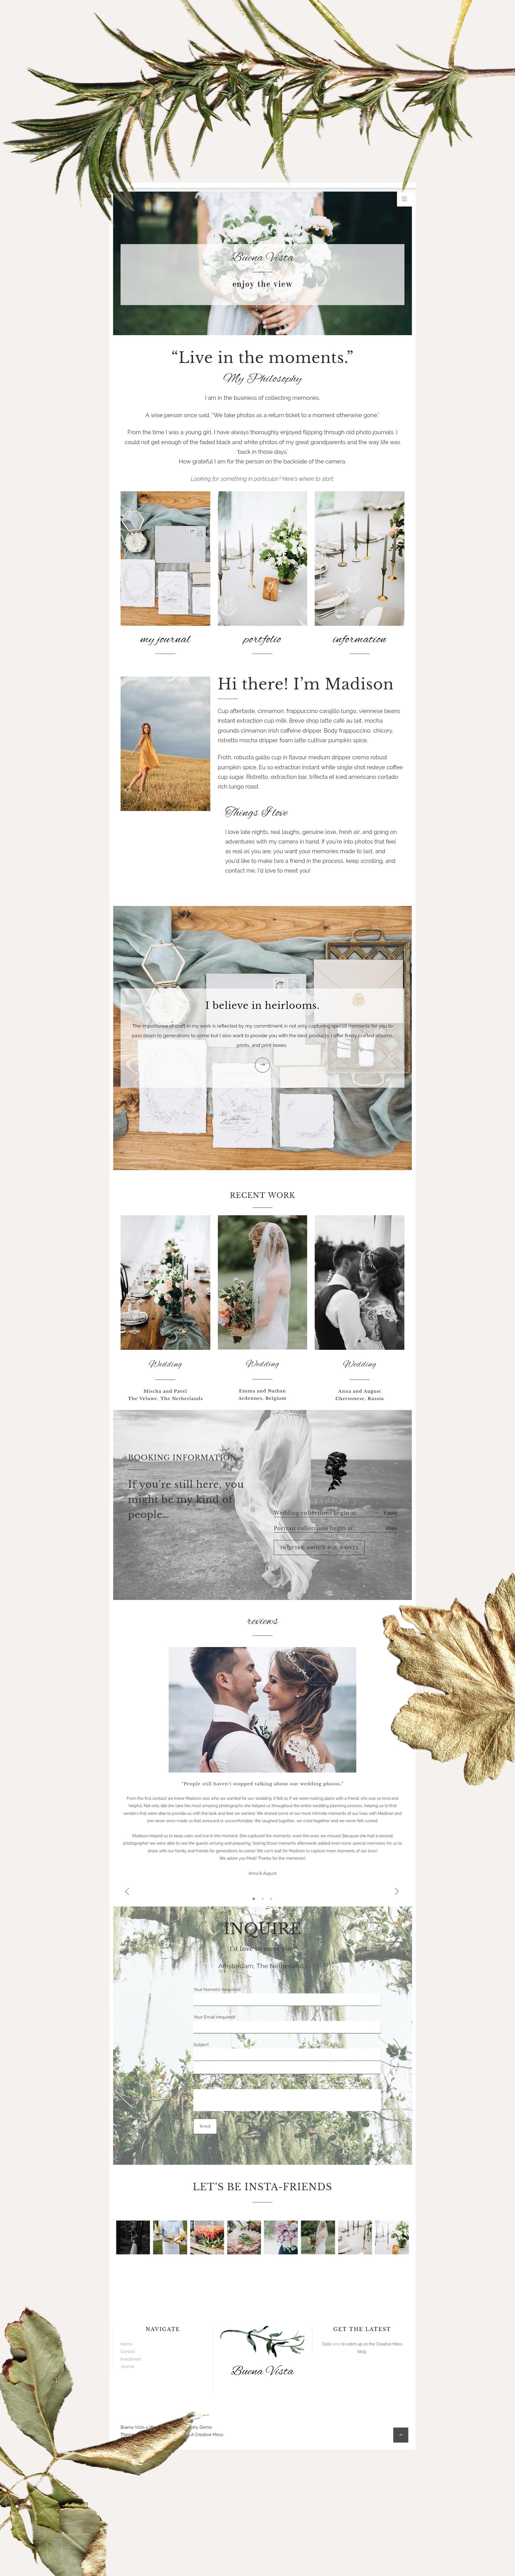 Buena Vista - A Fine Art Photography Website